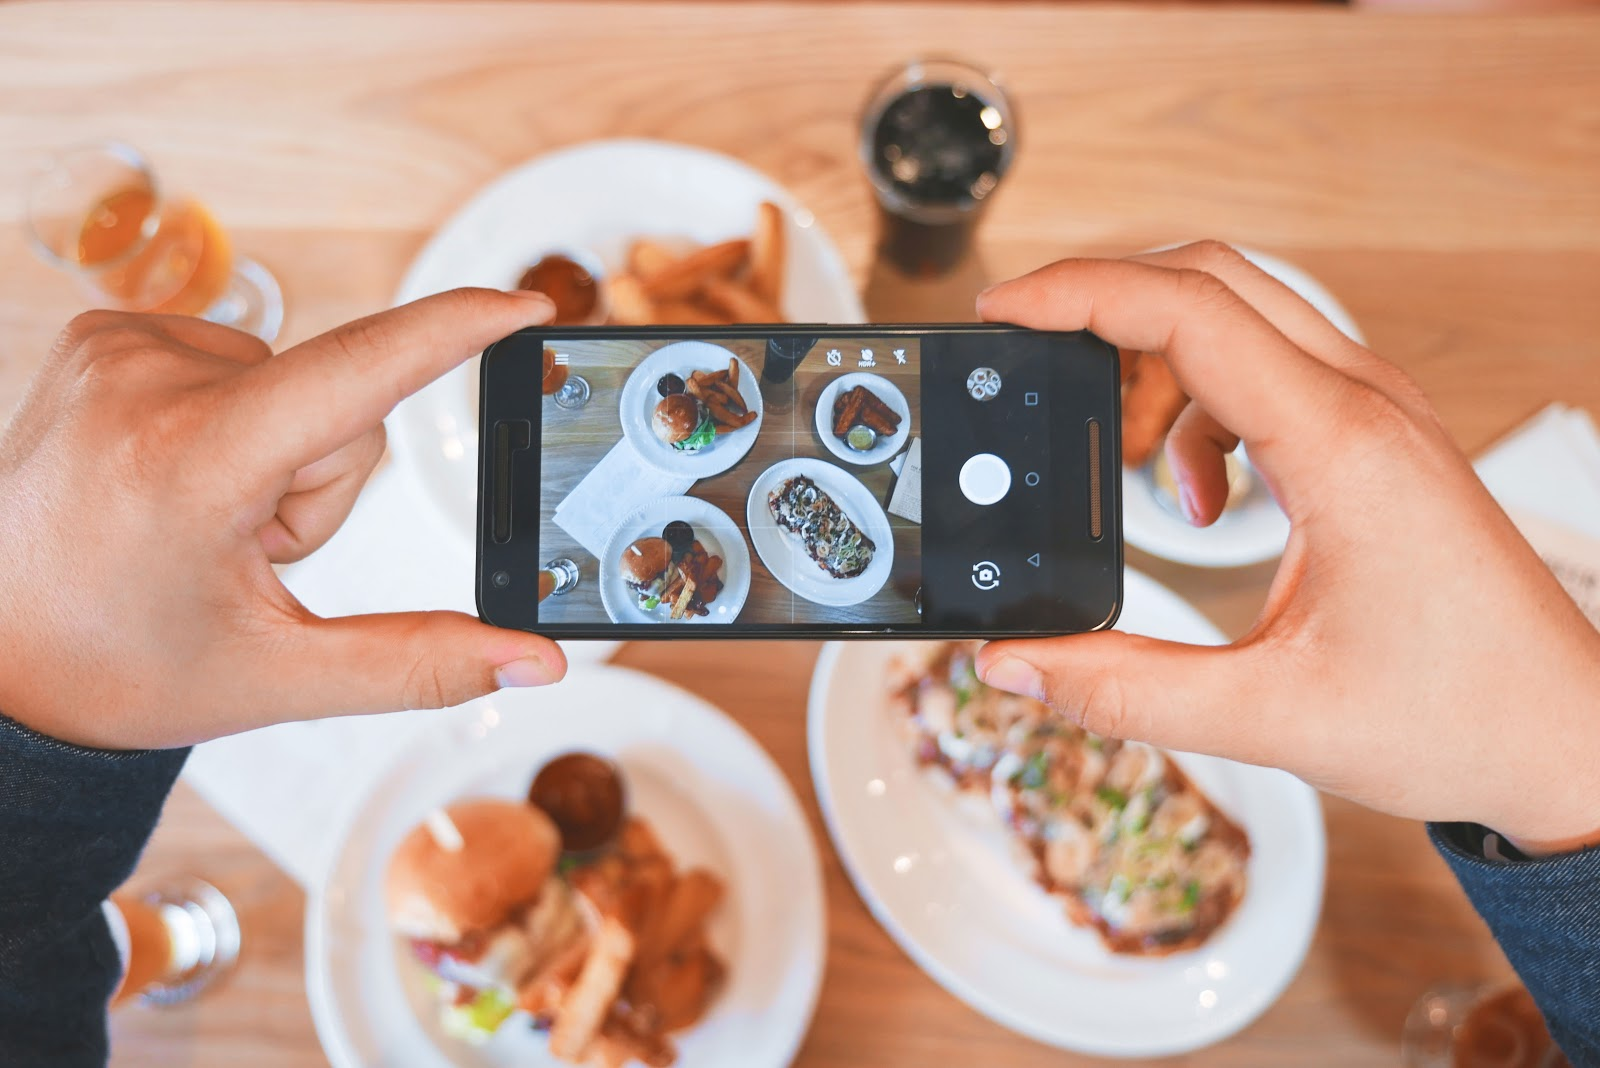 Customer taking Instagram photo